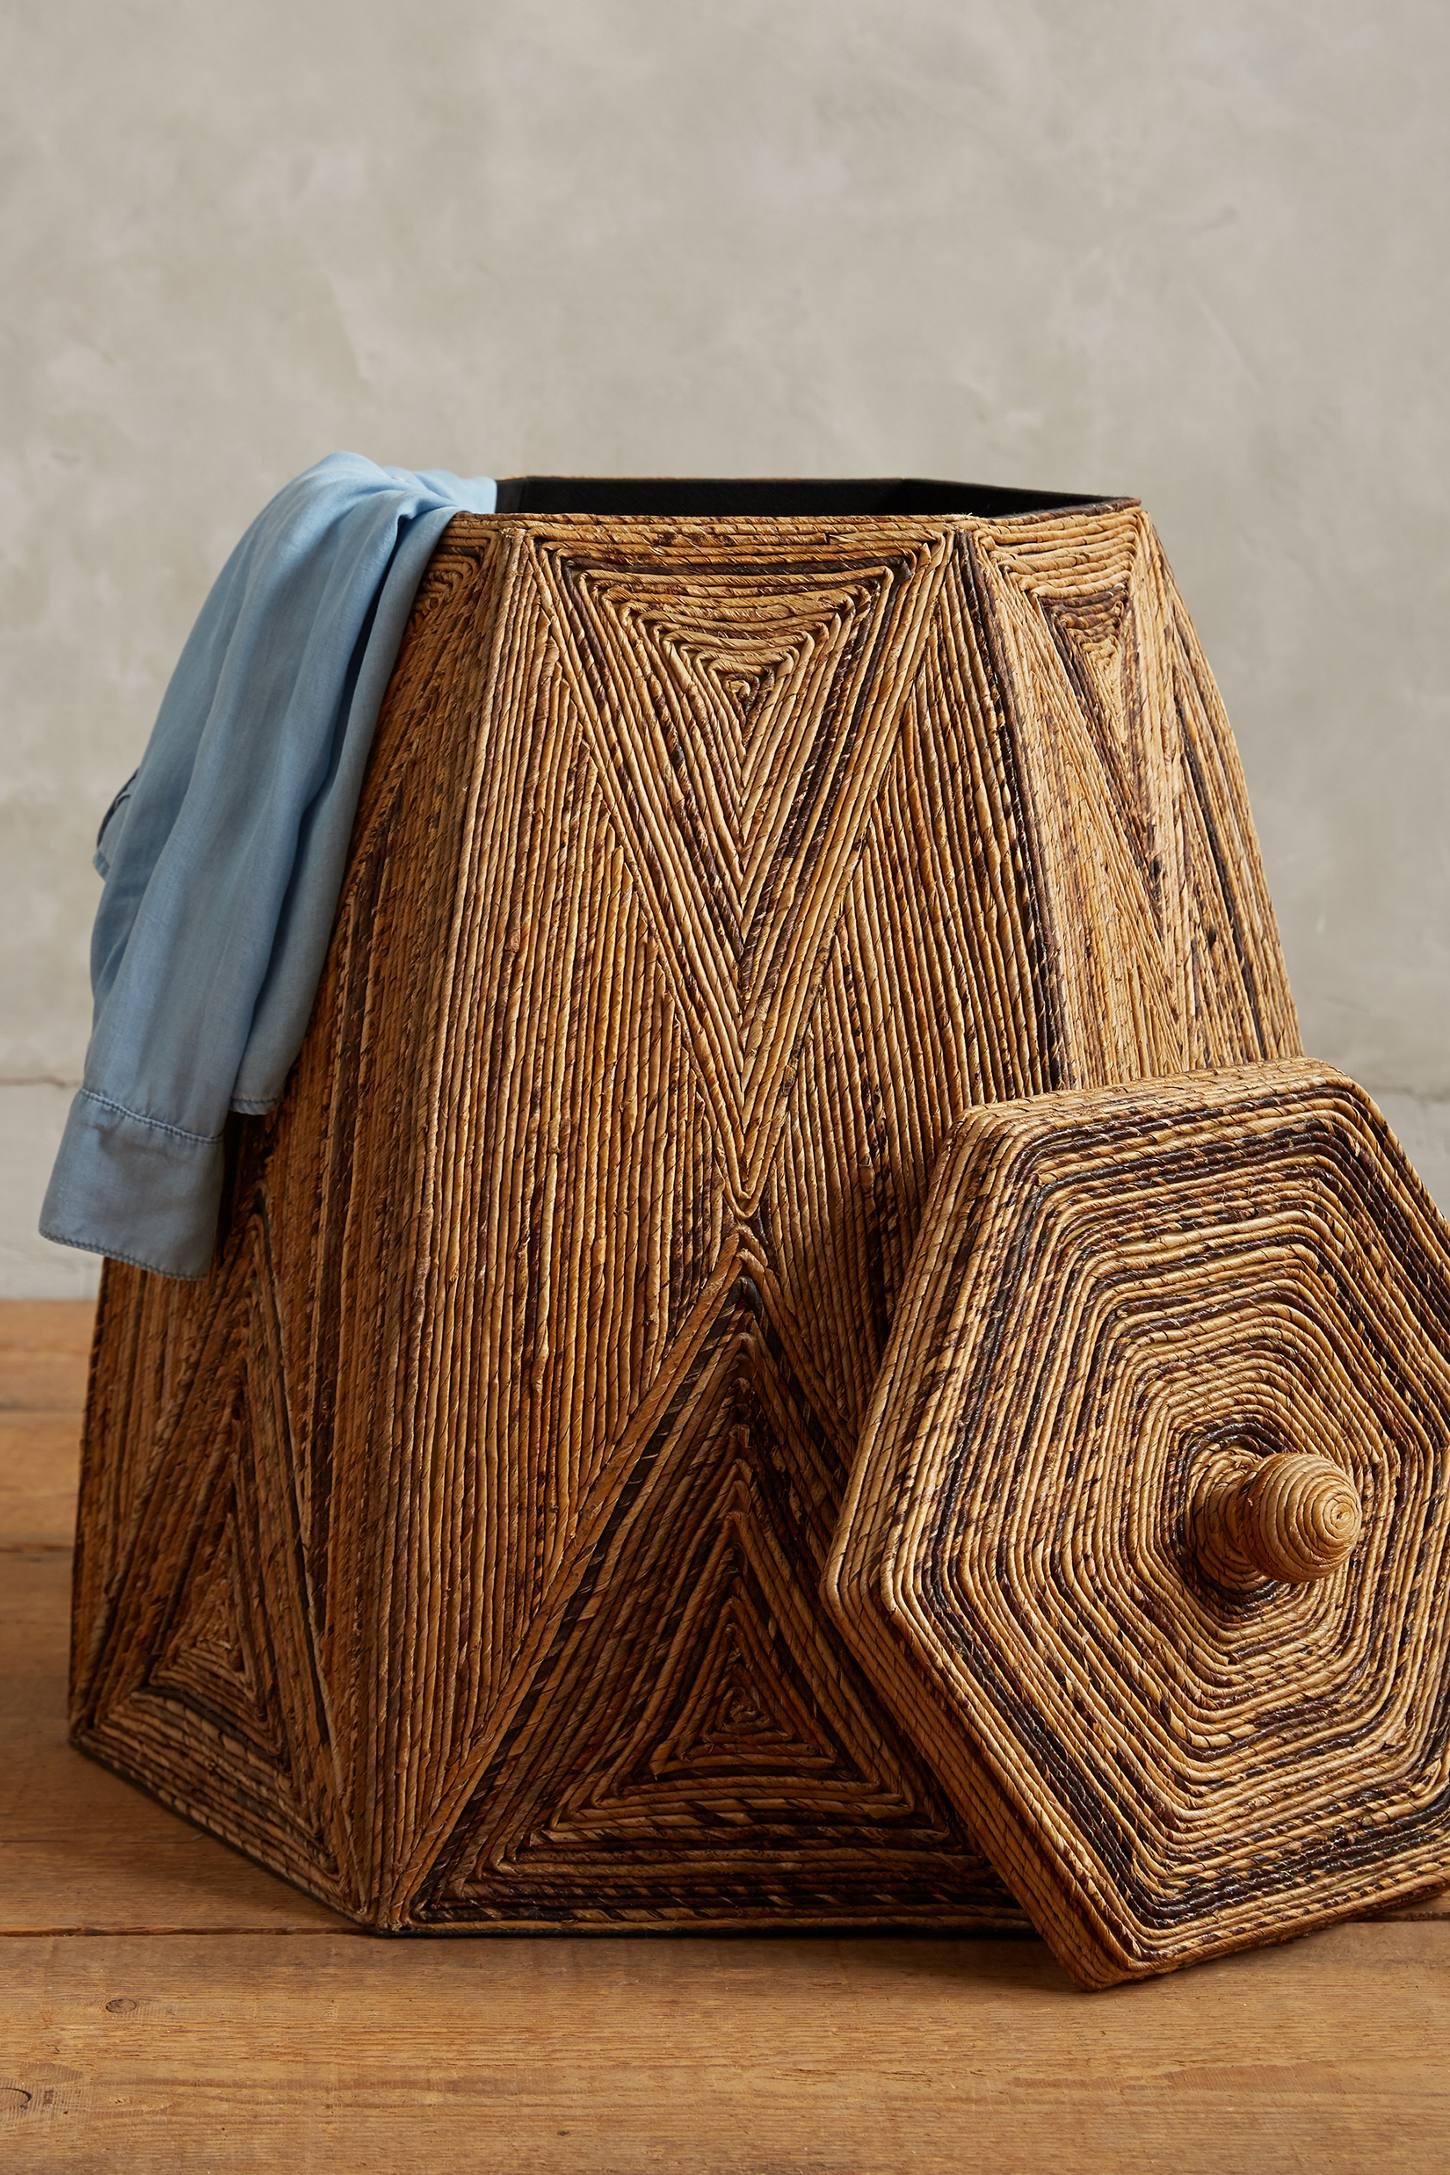 20 Laundry Basket Designs That Make Household Chores Stylish